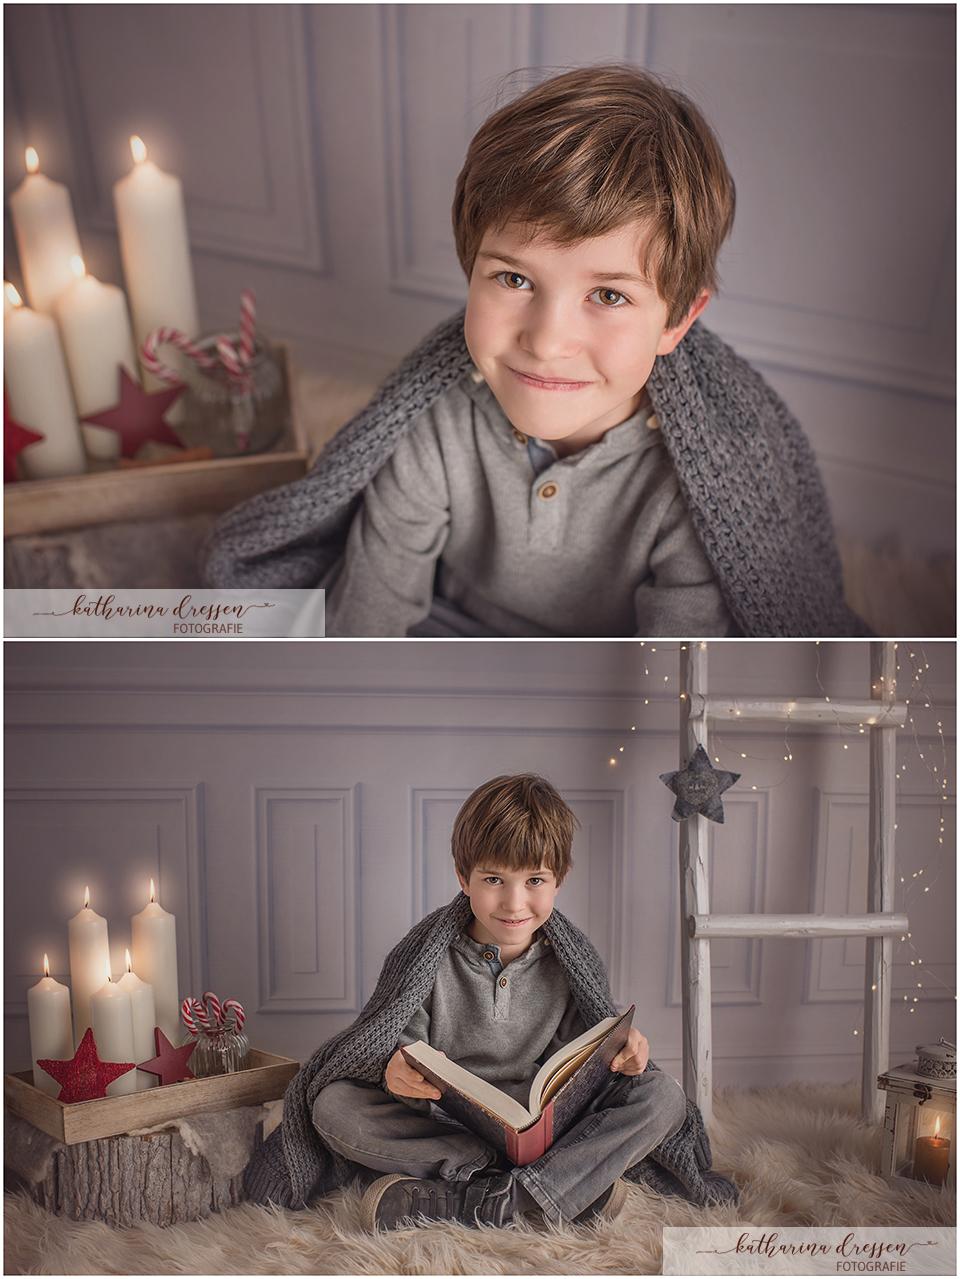 5_Kinderfotograf_Kinderfotoshooting_Familienbilder_Kinder-Fotoshooting_Fotograf_Duesseldorf_Fotodtudio_Moenchengladbach